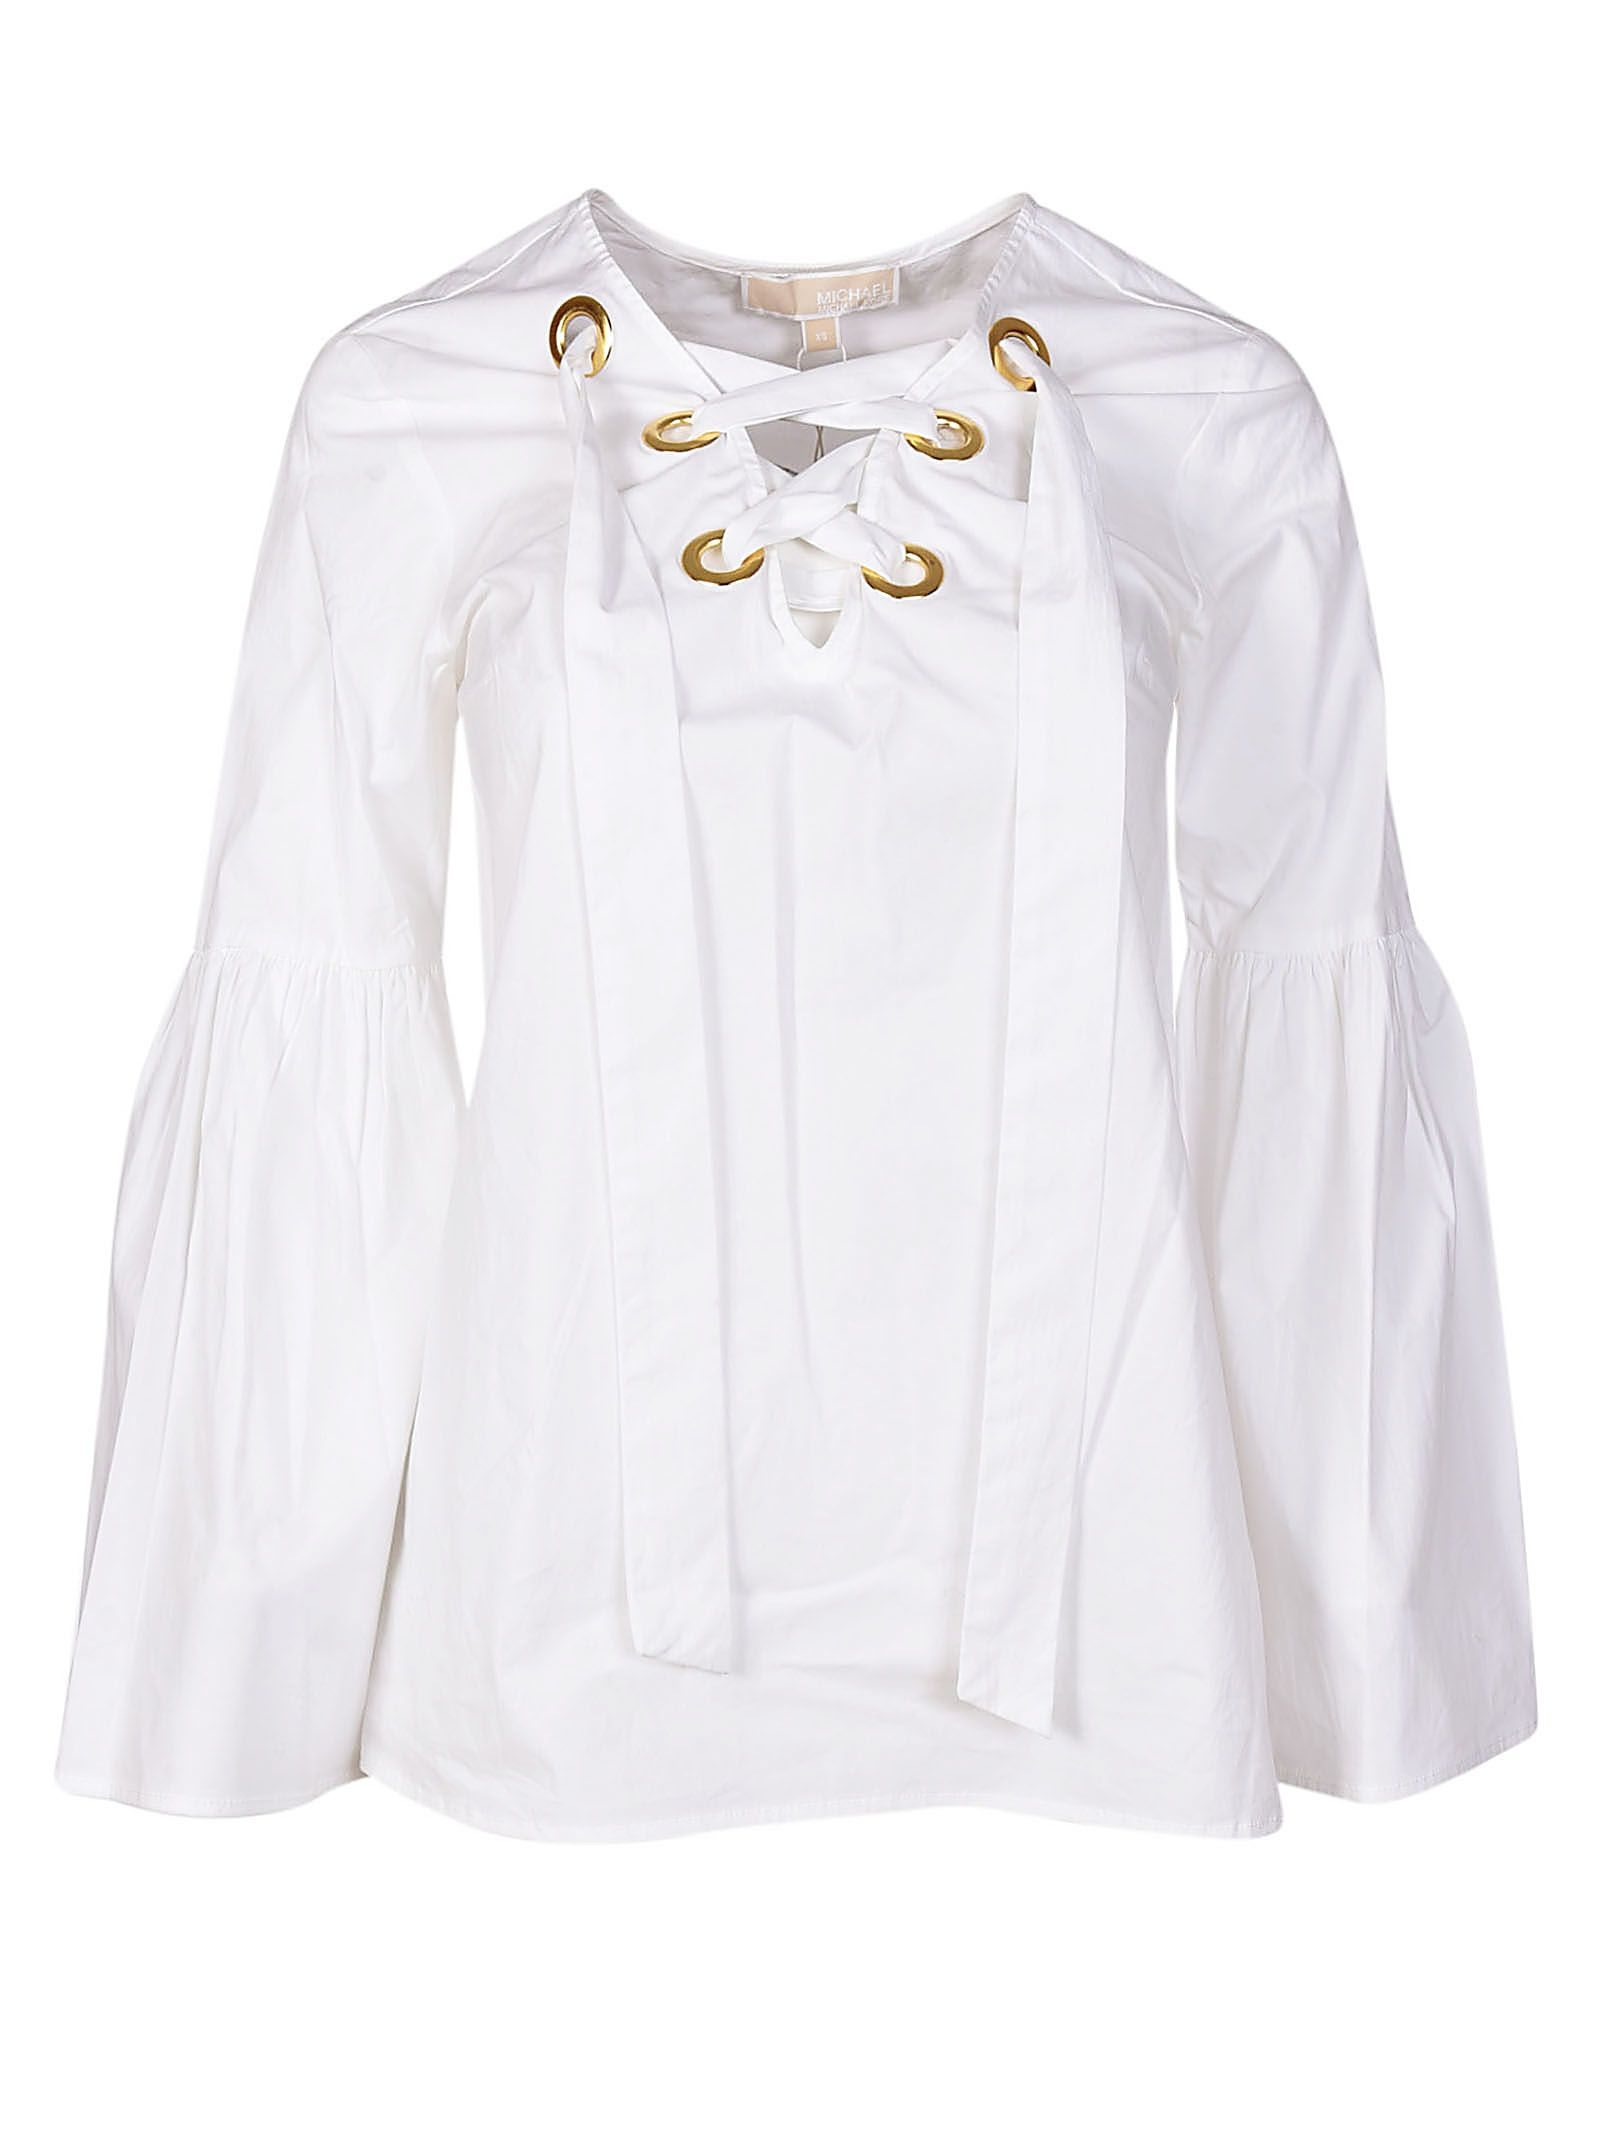 Michael Kors Long-sleeved Tie Neck Blouse